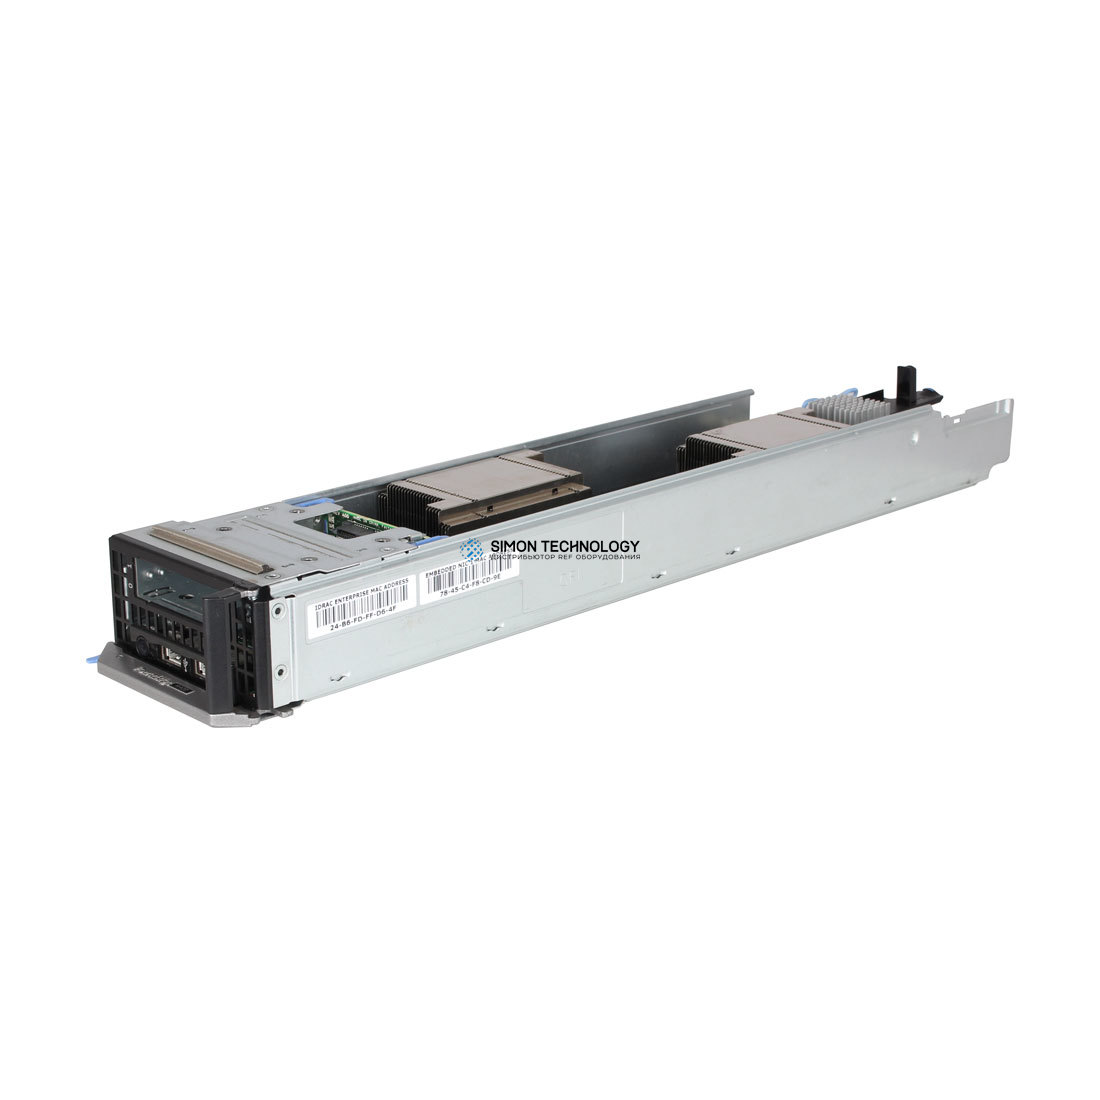 Сервер Dell PEM420 CTO PERC H310 ENTERPRISE LICENSE (M420 ENT H310)